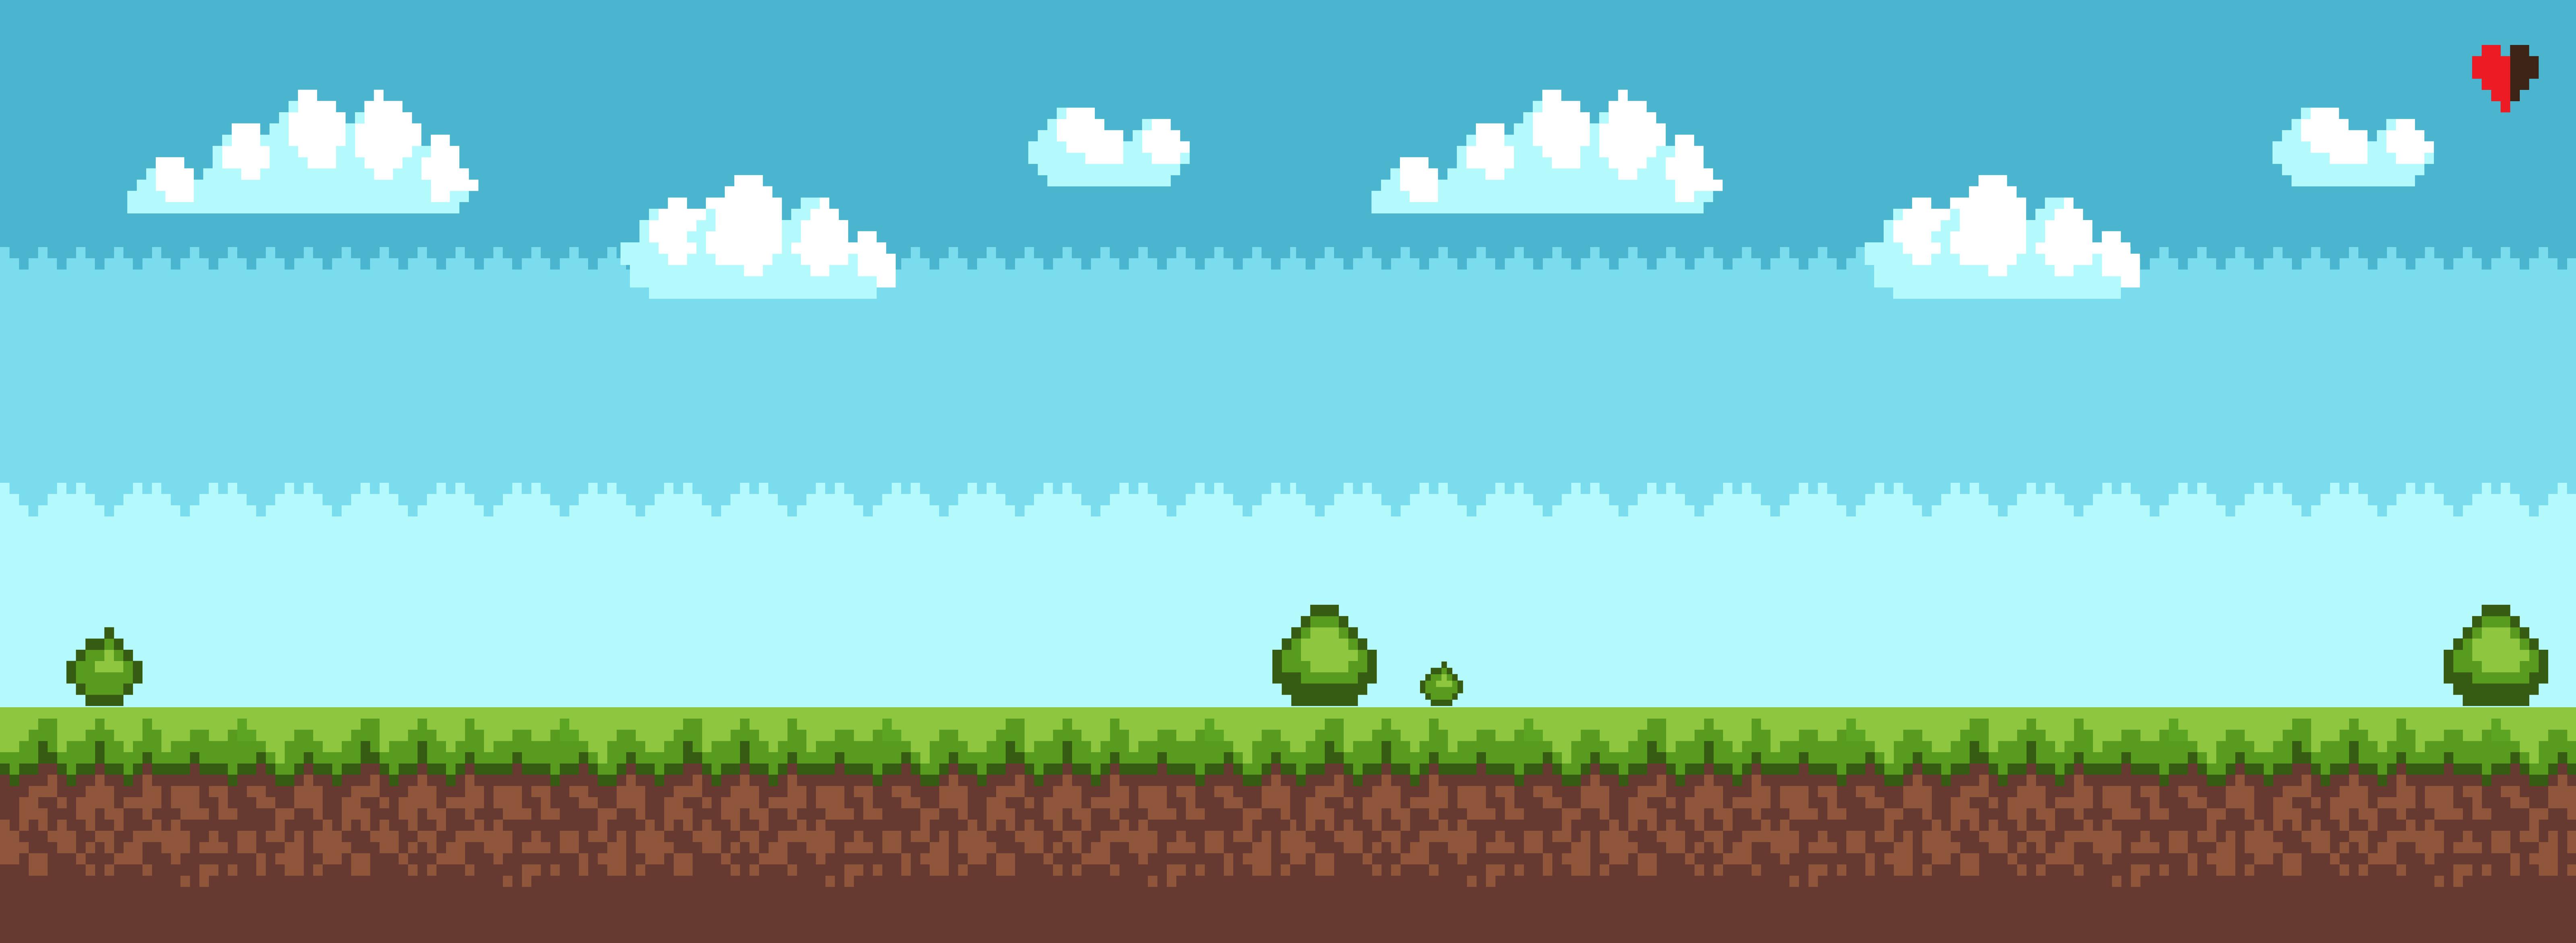 Week 4: Video Game Creation (9am, Jared)